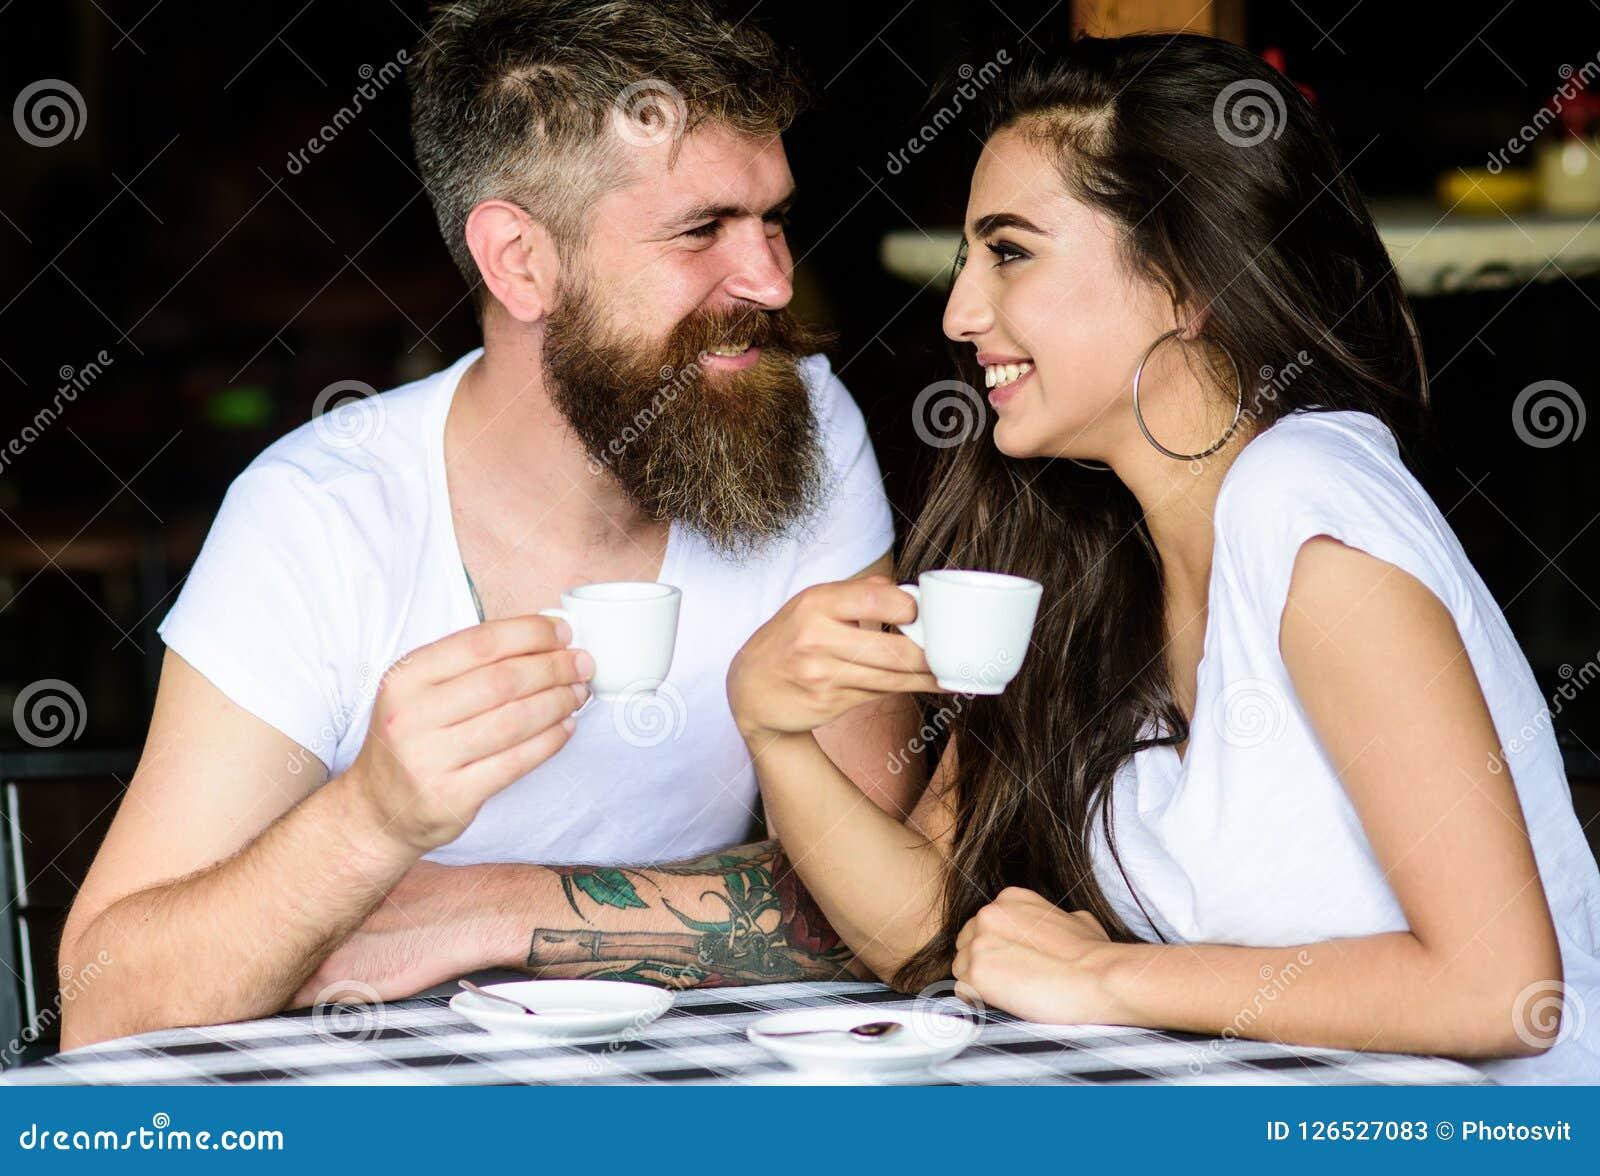 esprezzo dating online dating er for tapere